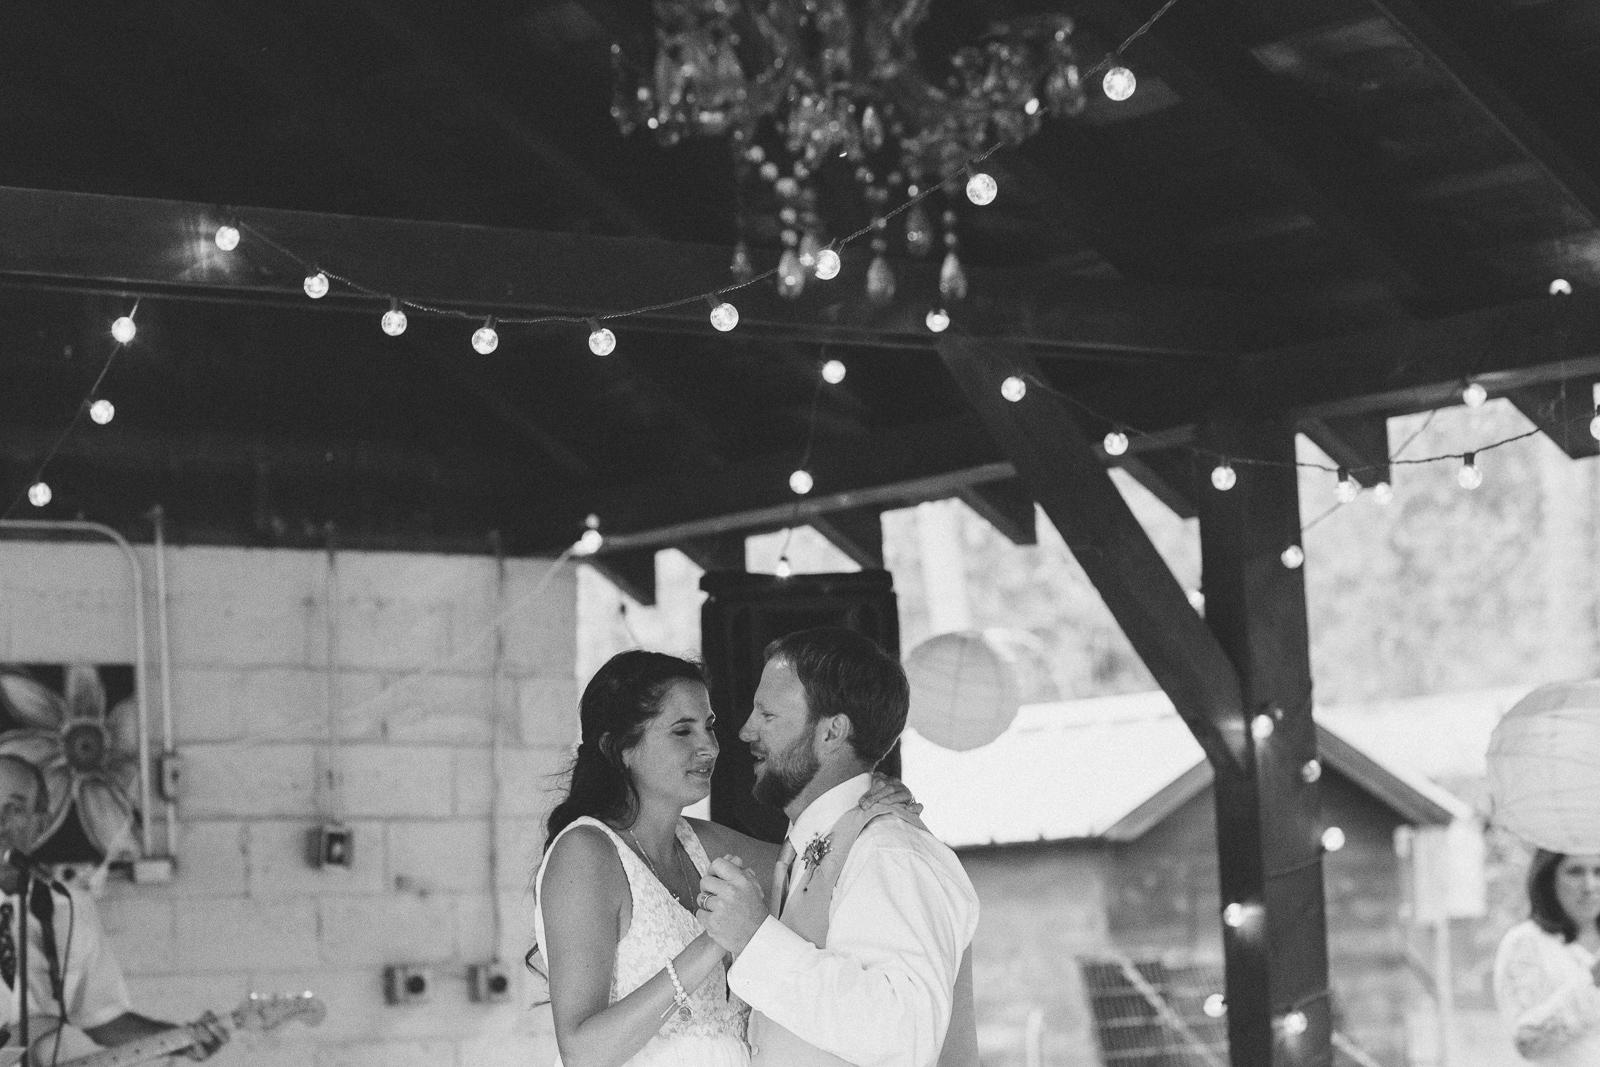 162-wedding-fun-photography-reception-unique-nature-trees